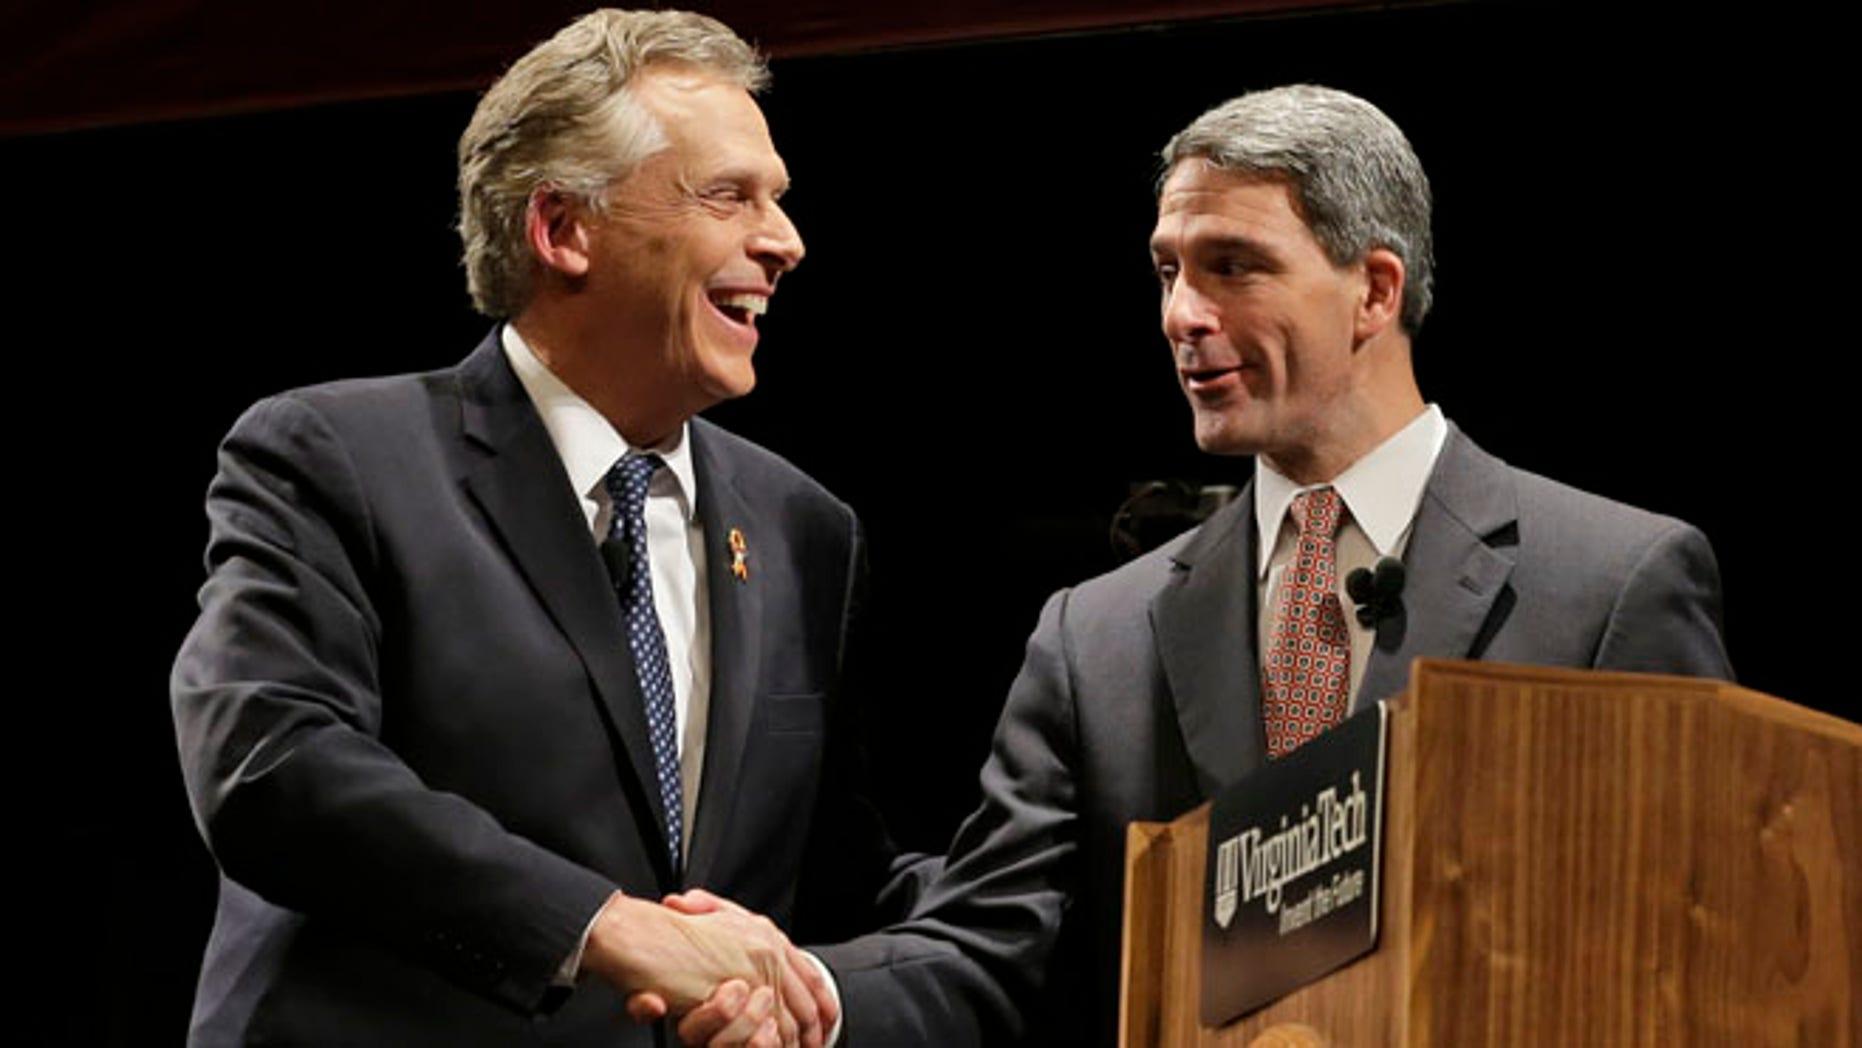 Democratic gubernatorial candidate, Terry McAuliffe and Republican challenger Virginia Attorney General Ken Cuccinelli after a debate at Virginia Tech in Blacksburg, Va., Thursday, Oct. 24, 2013.